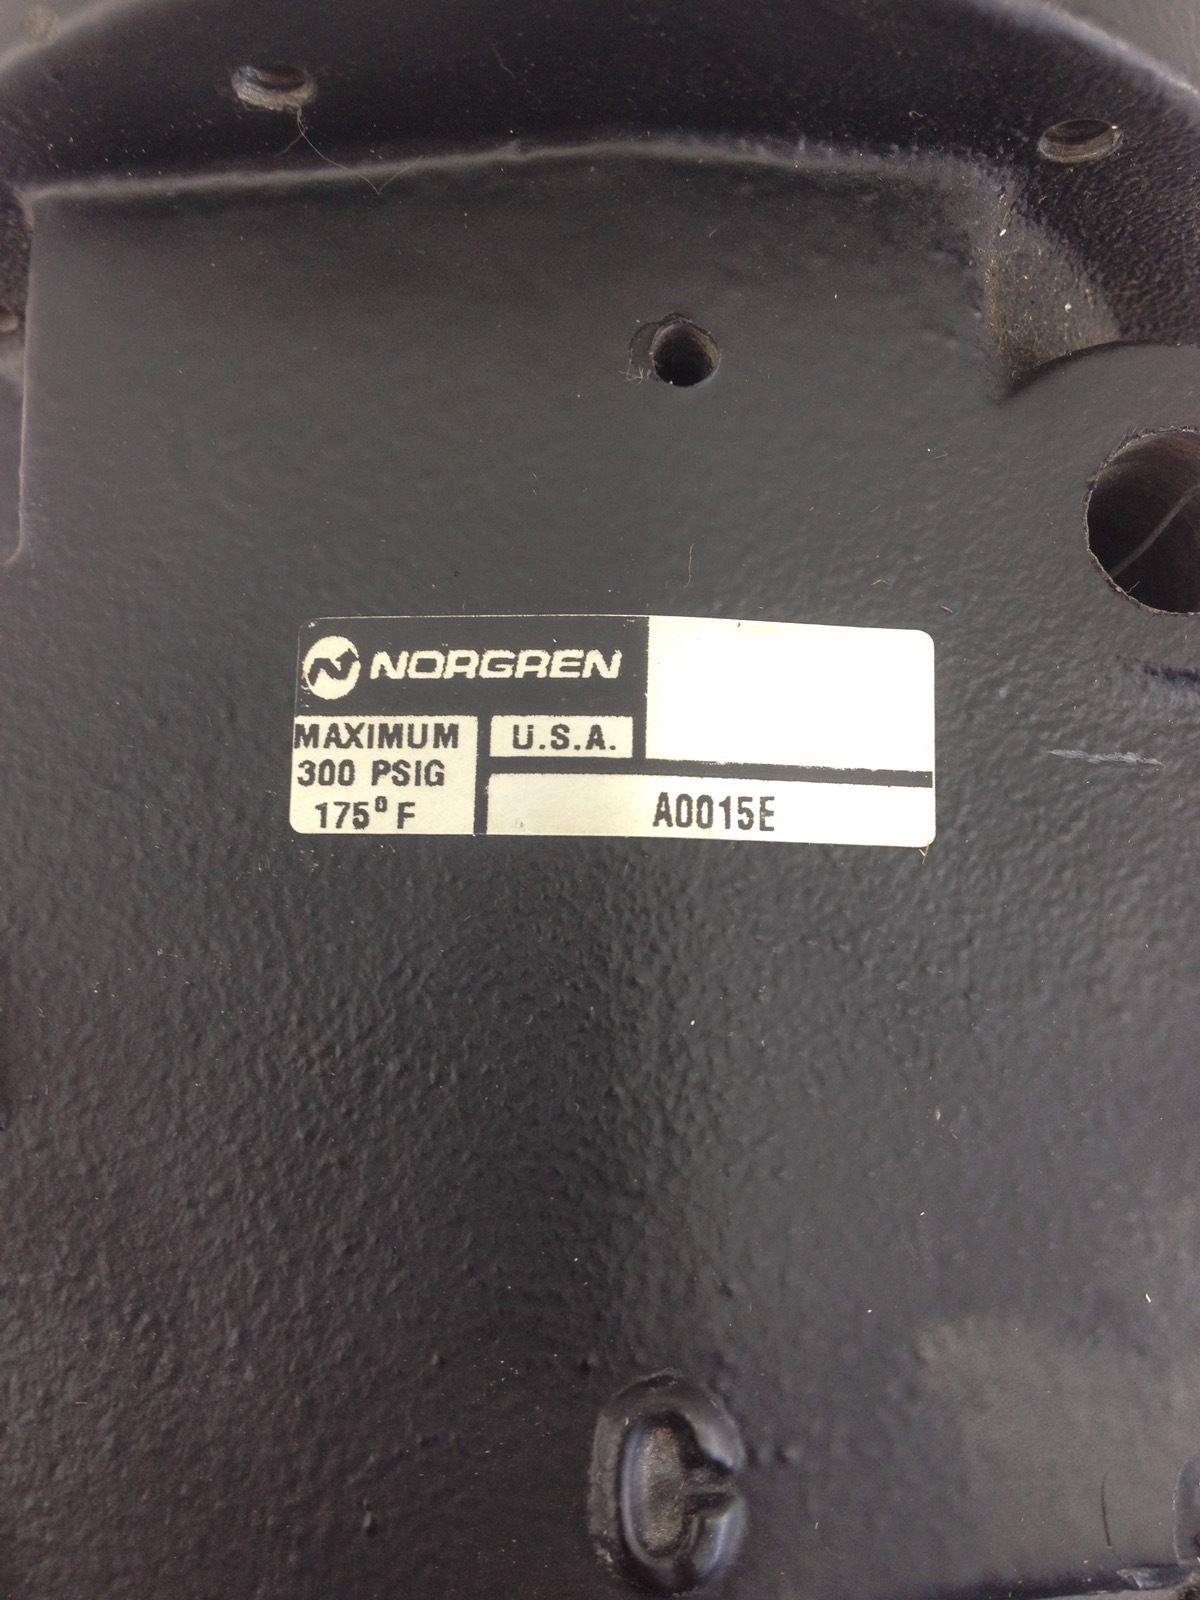 NEW! NORGREN A0015E SMOOTH START VALVE 701240-A 300PSIG FAST SHIP!!! (B212) 2